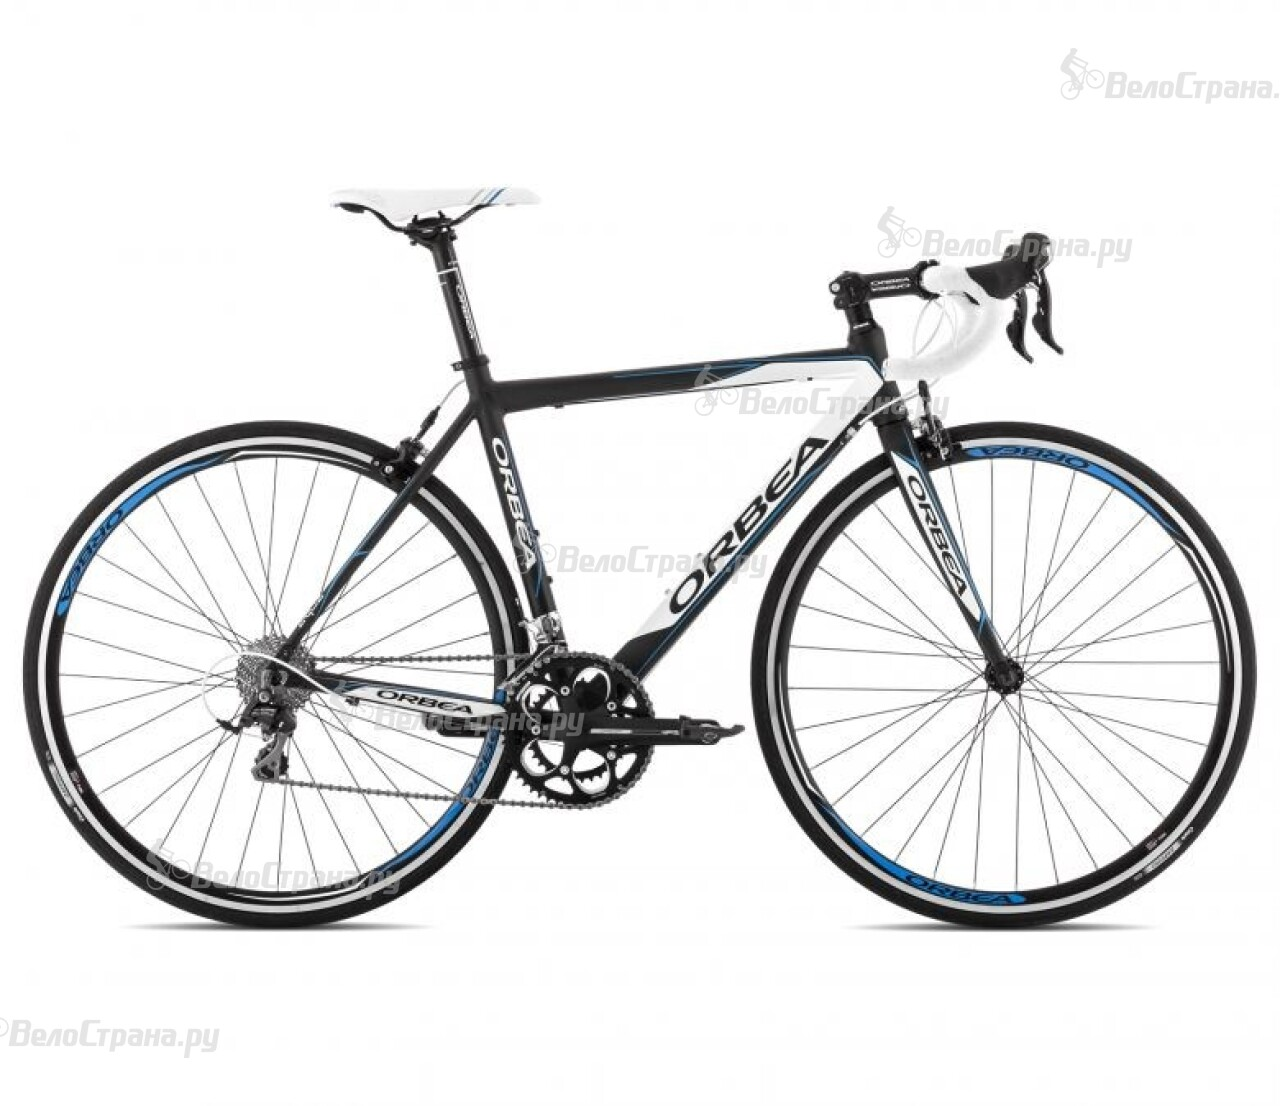 Велосипед Orbea Aqua 10 (2014)